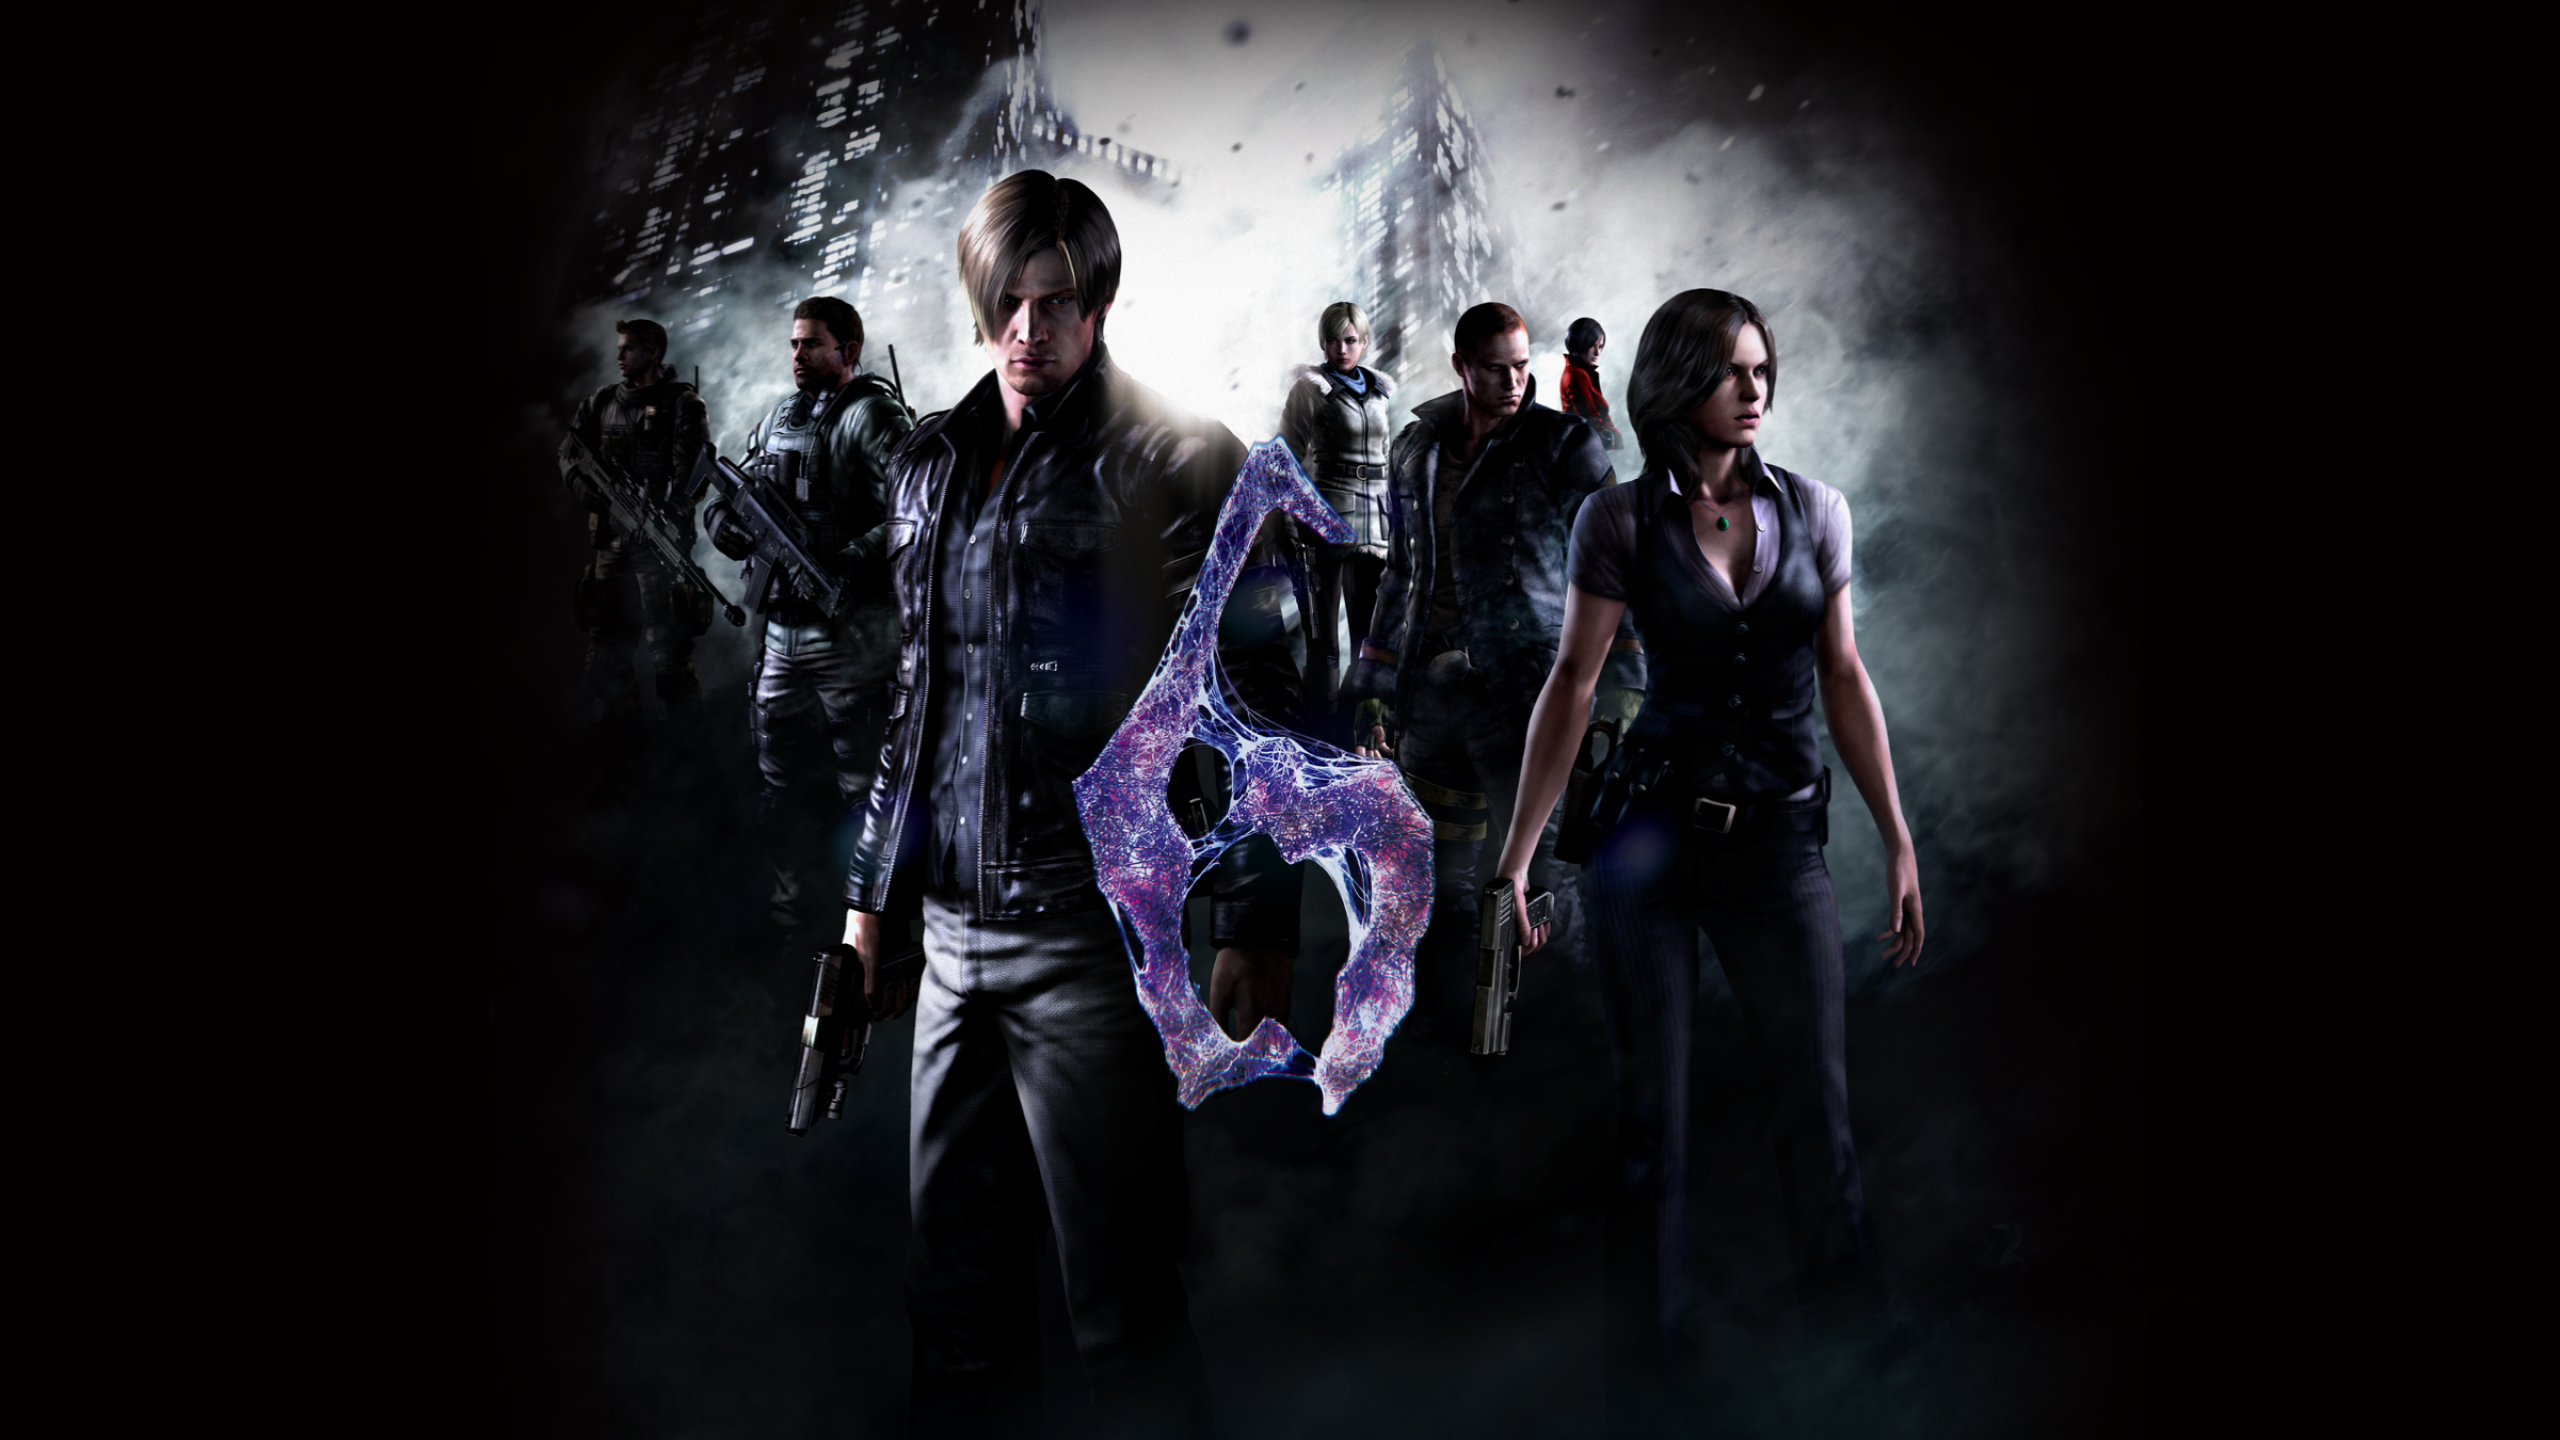 2560x1440 Resident Evil 6 1440p Resolution Wallpaper Hd Games 4k